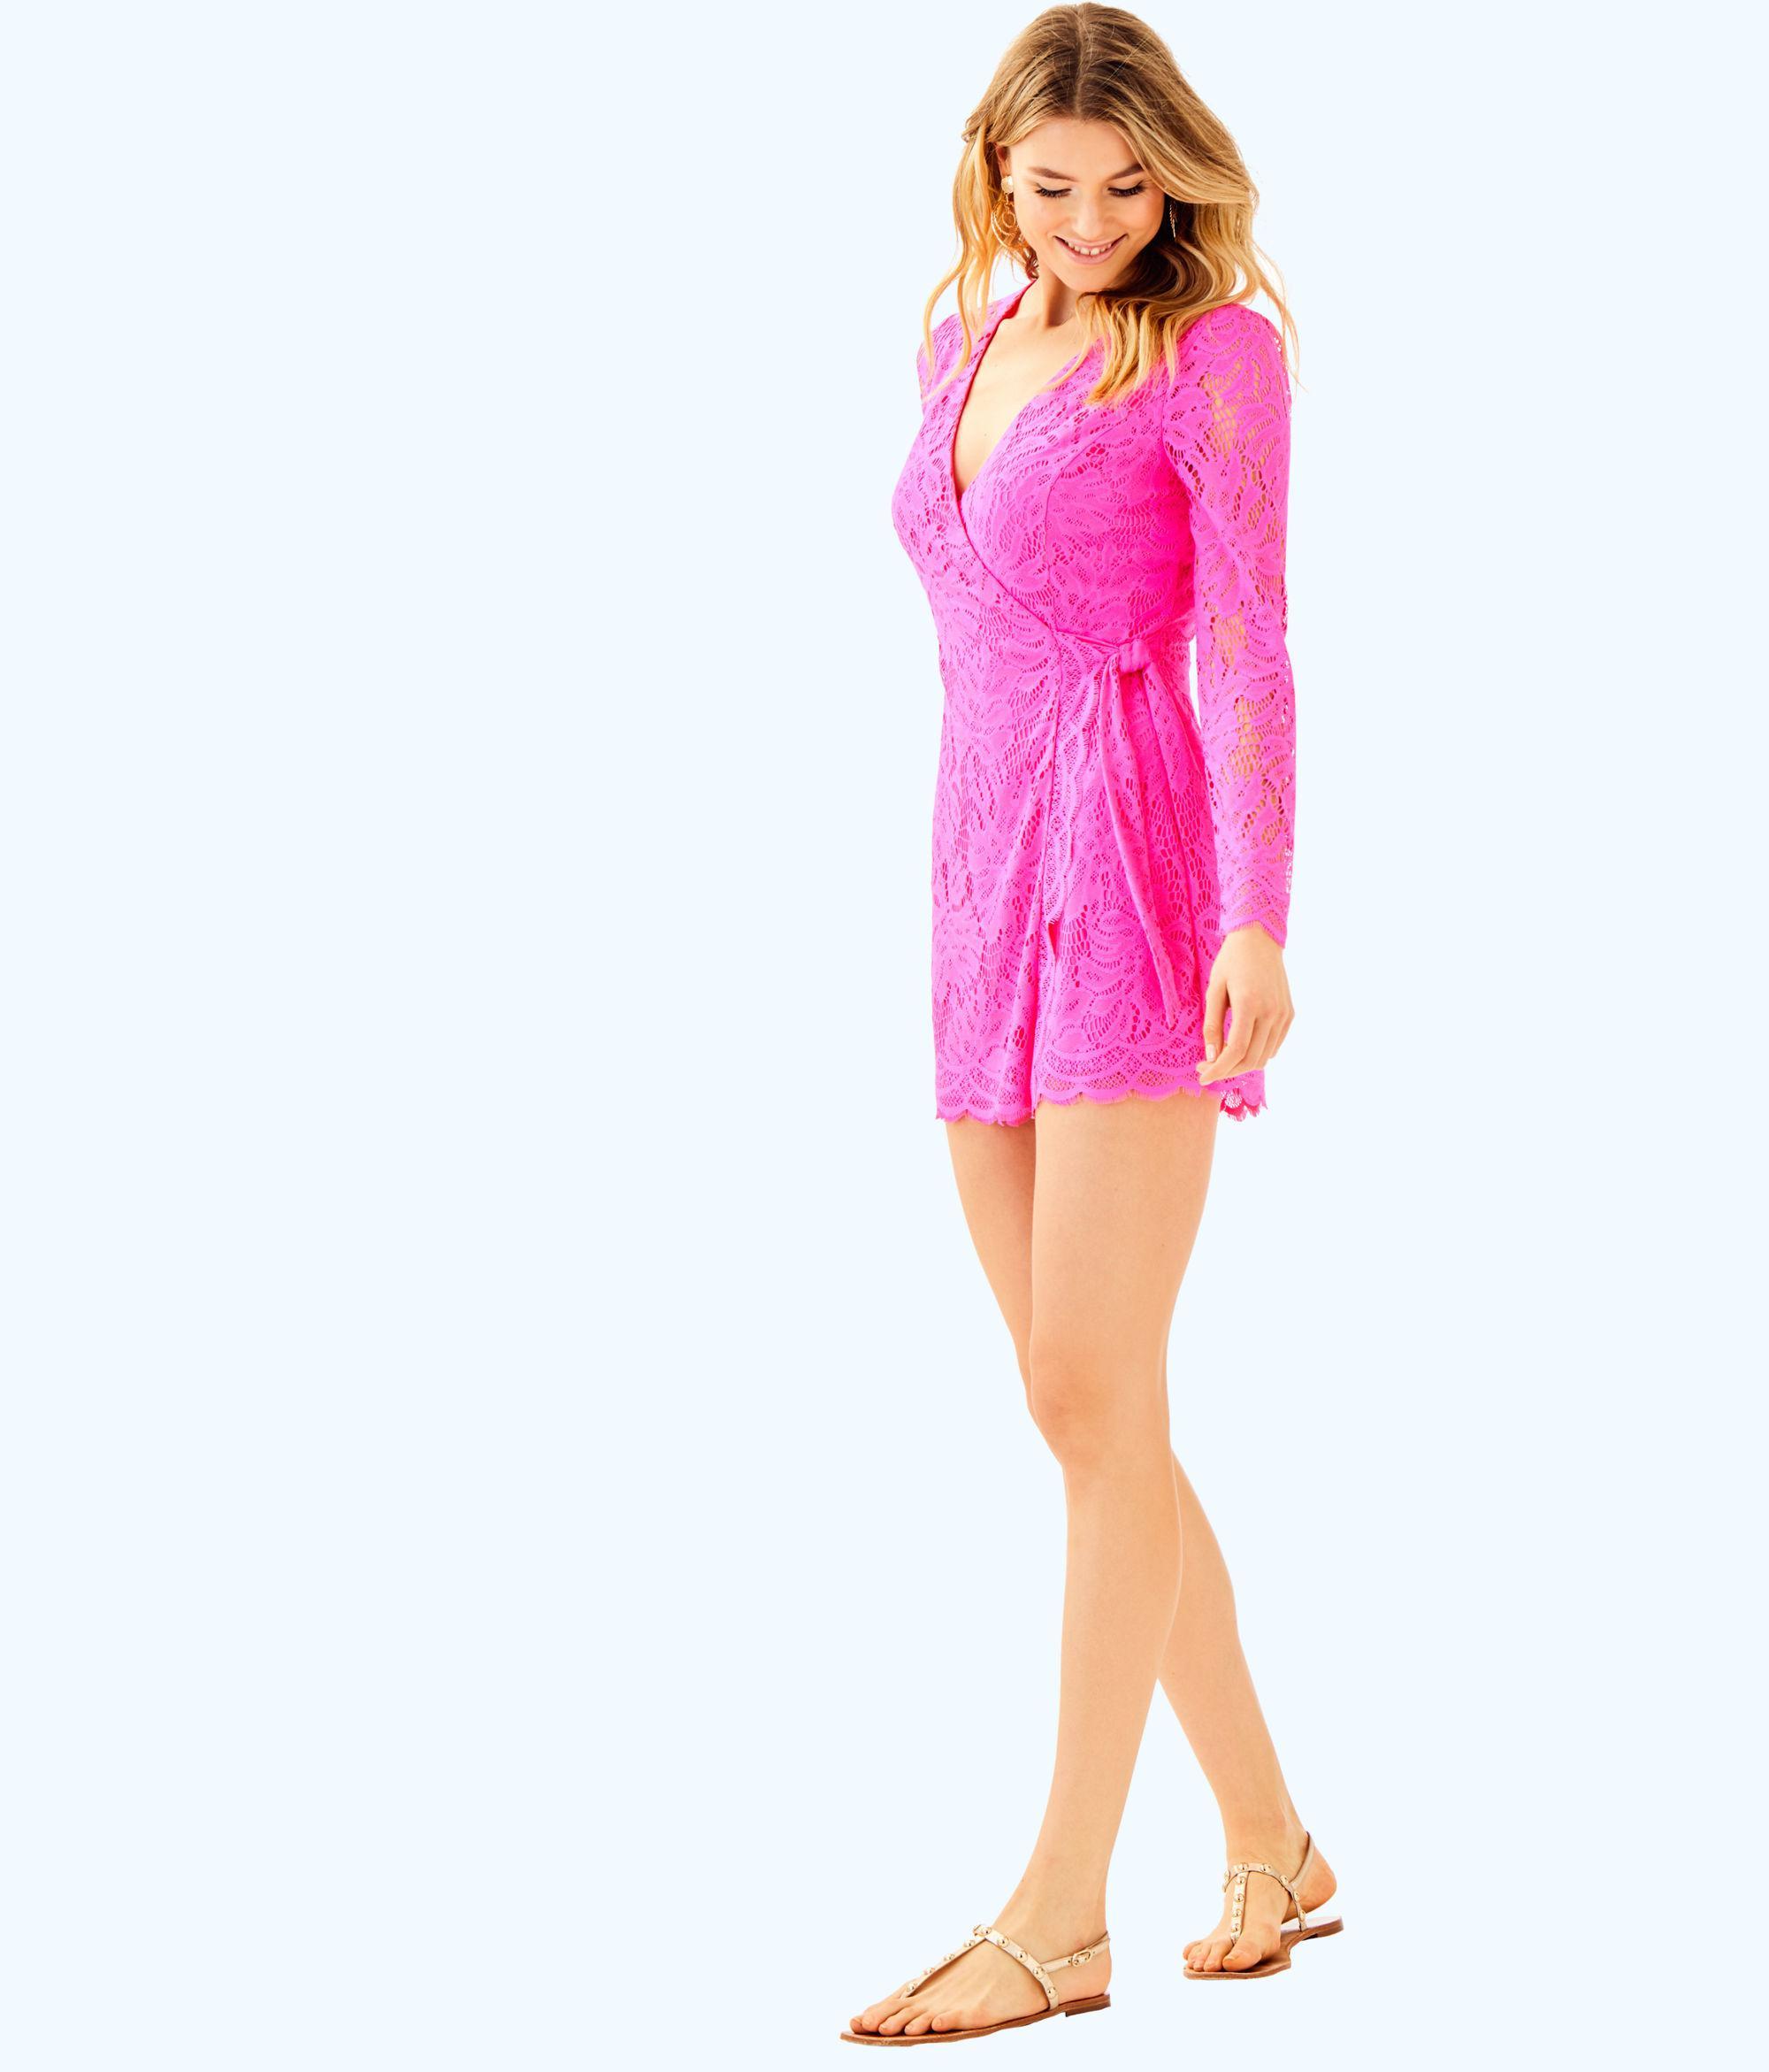 d7feea142ae Lyst - Lilly Pulitzer Tiki Wrap Romper in Pink